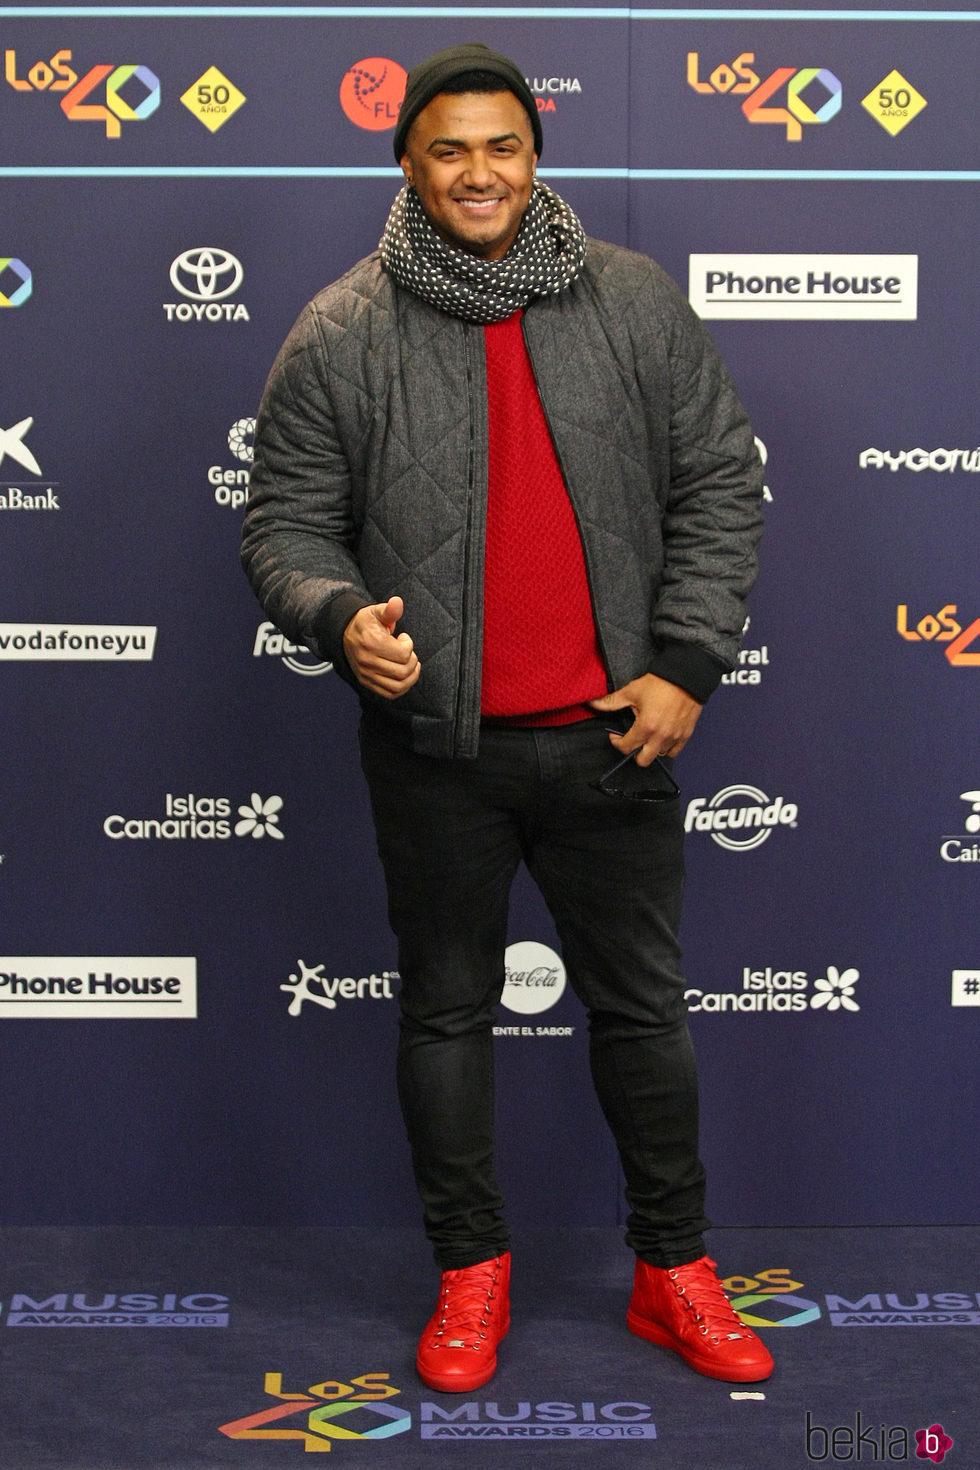 Henry Mendez en Los40 Music Awards 2016